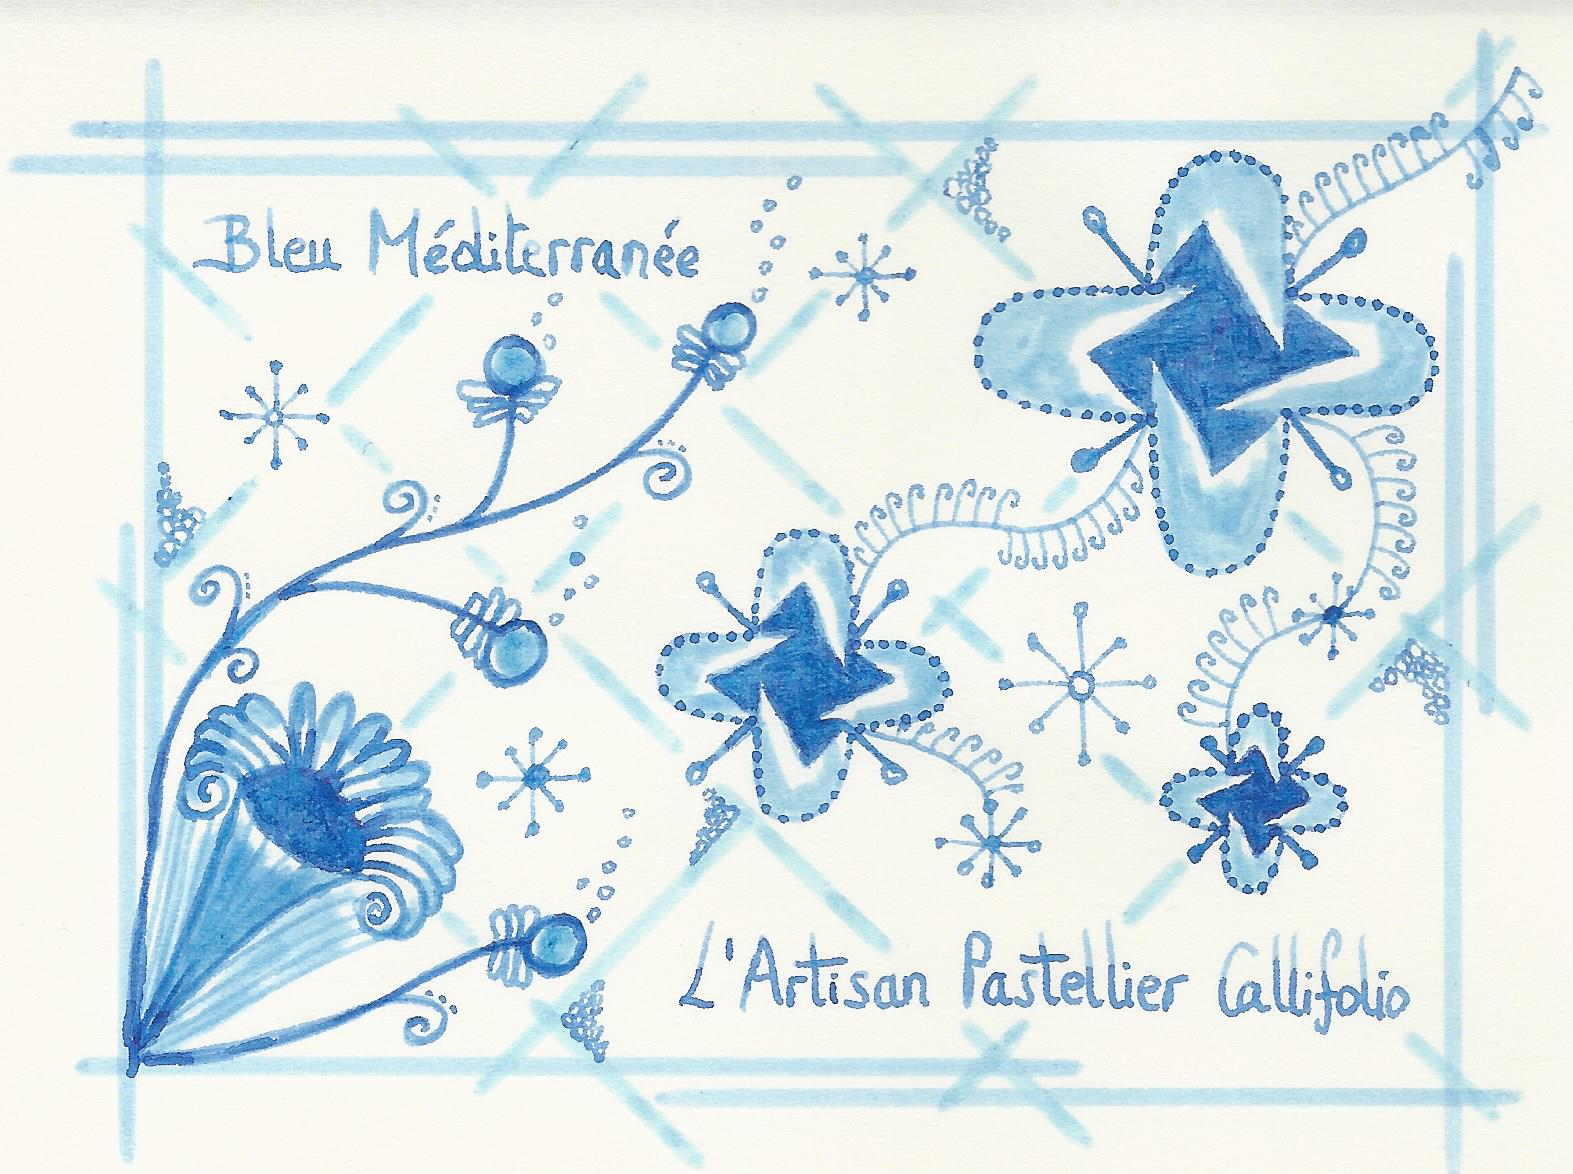 fpn_1570214959__callifolio_-_bleu_medite